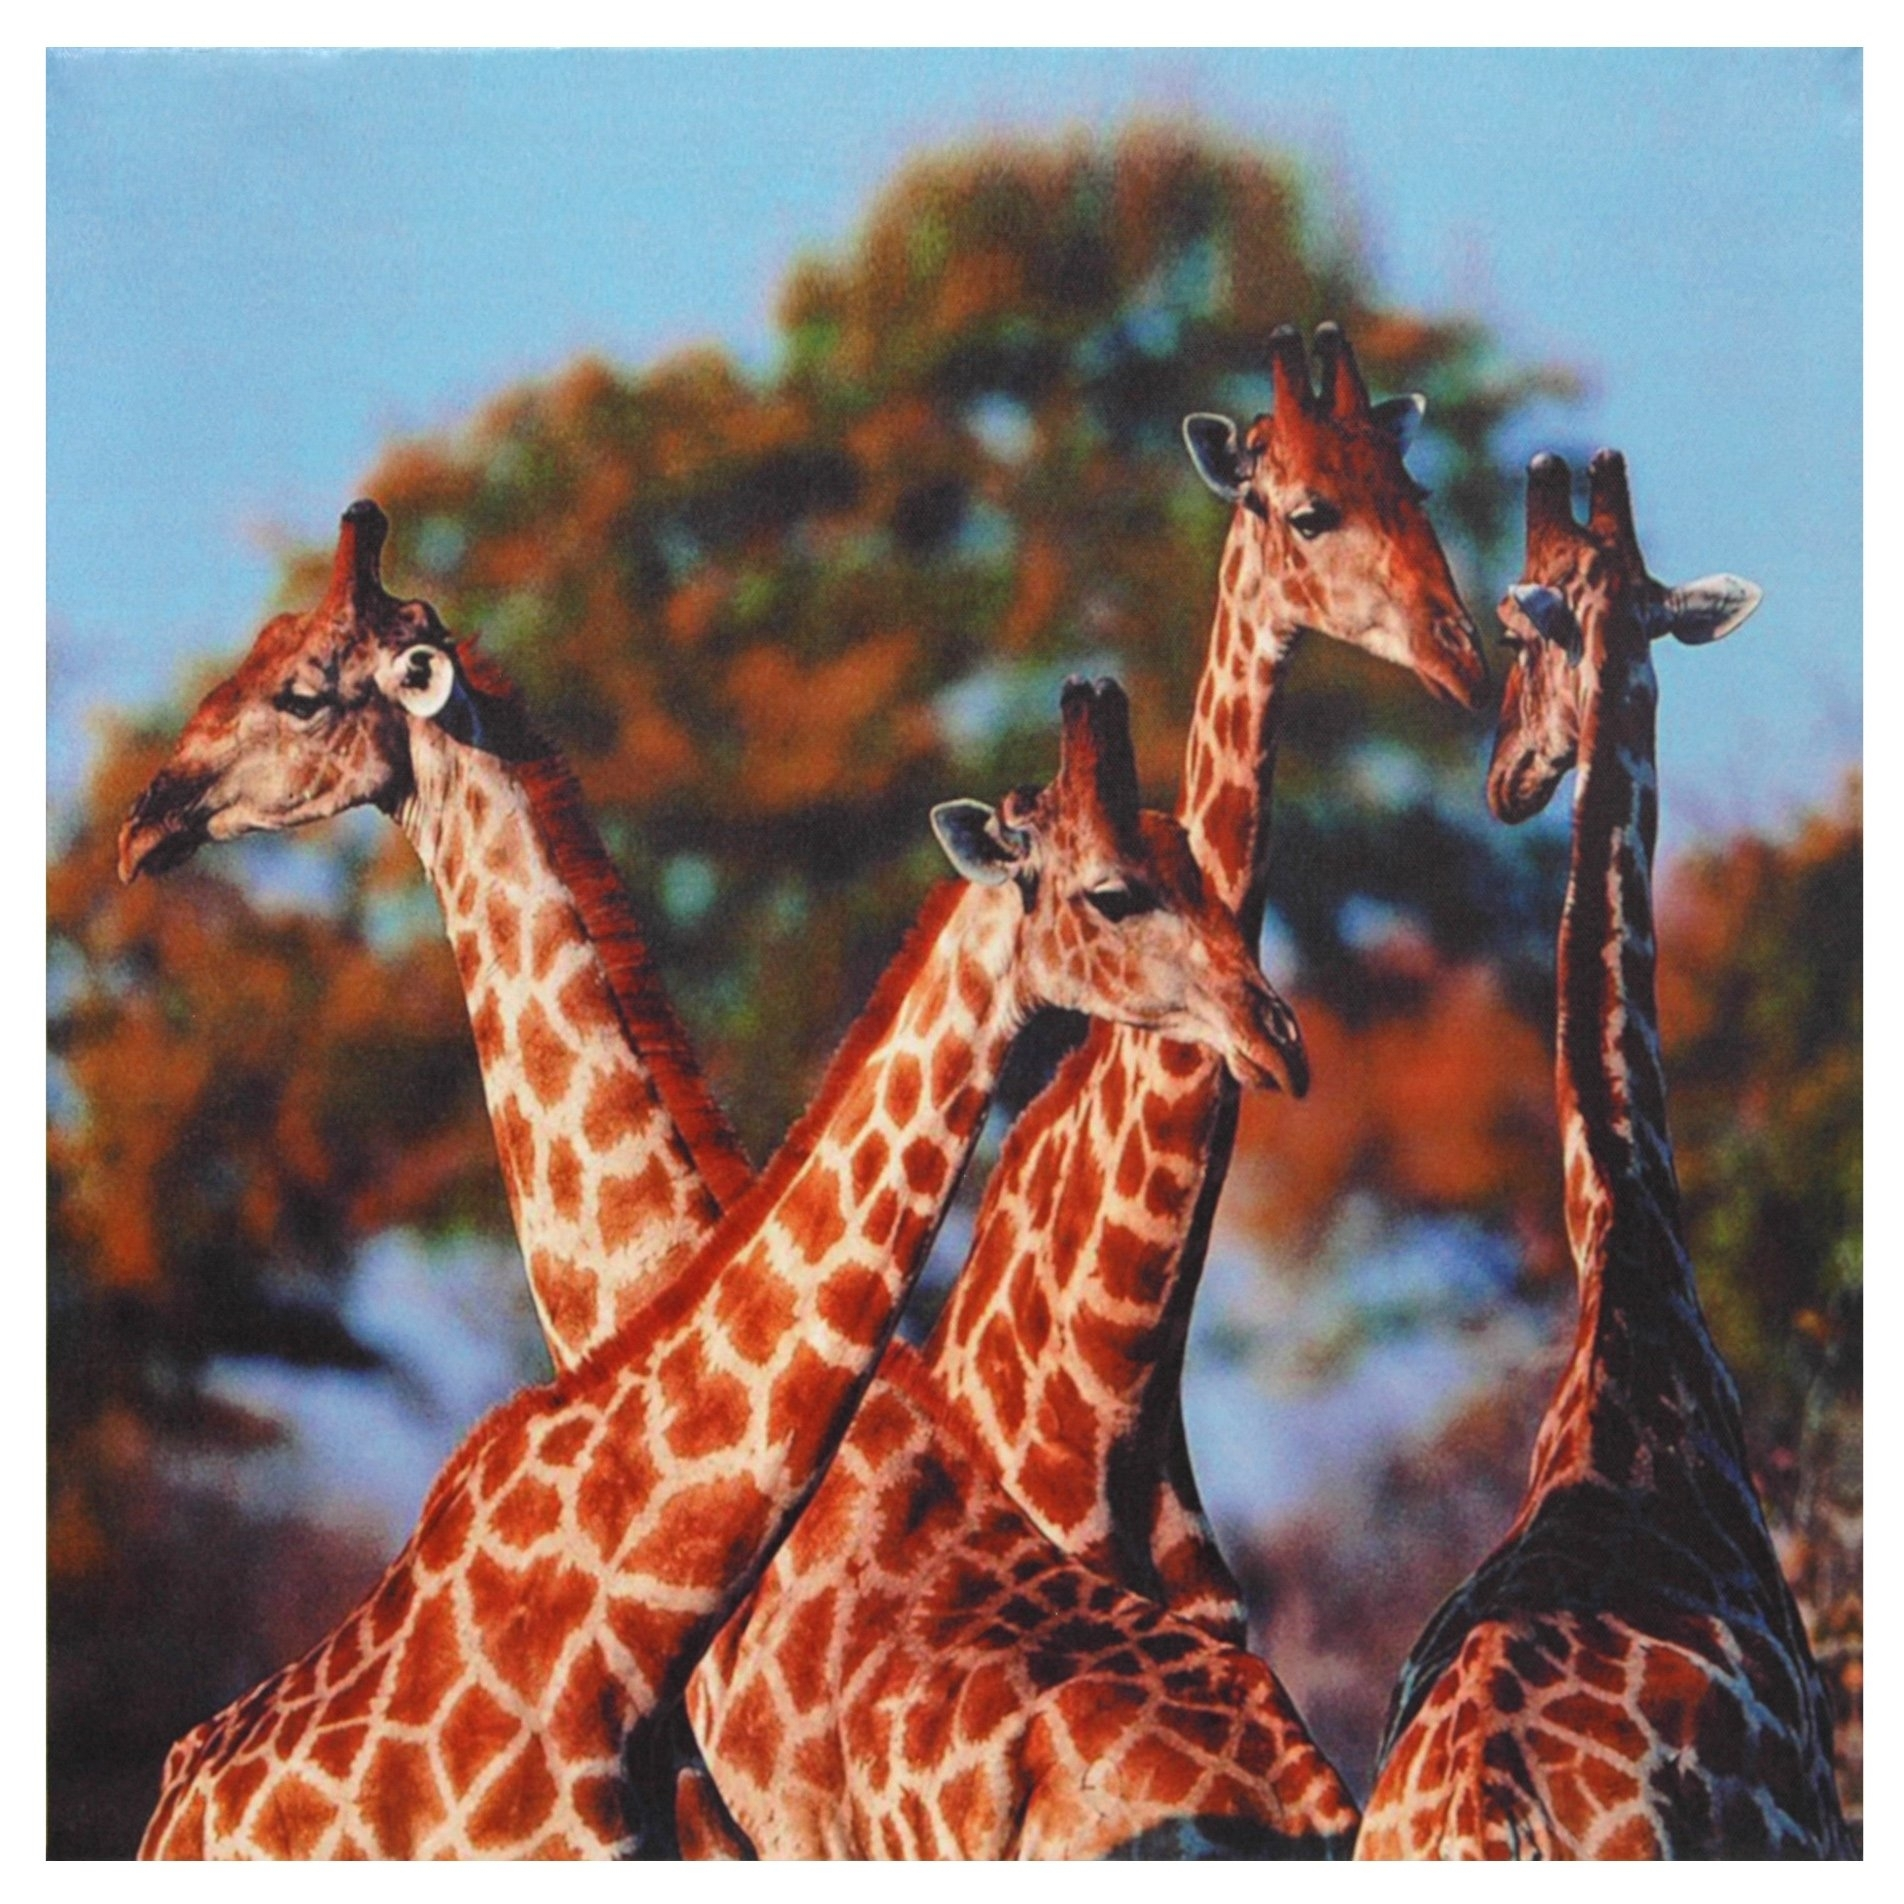 Oriental Furniture Four Prairie Giraffes Canvas Wall Art | Ebay pertaining to Giraffe Canvas Wall Art (Image 16 of 20)